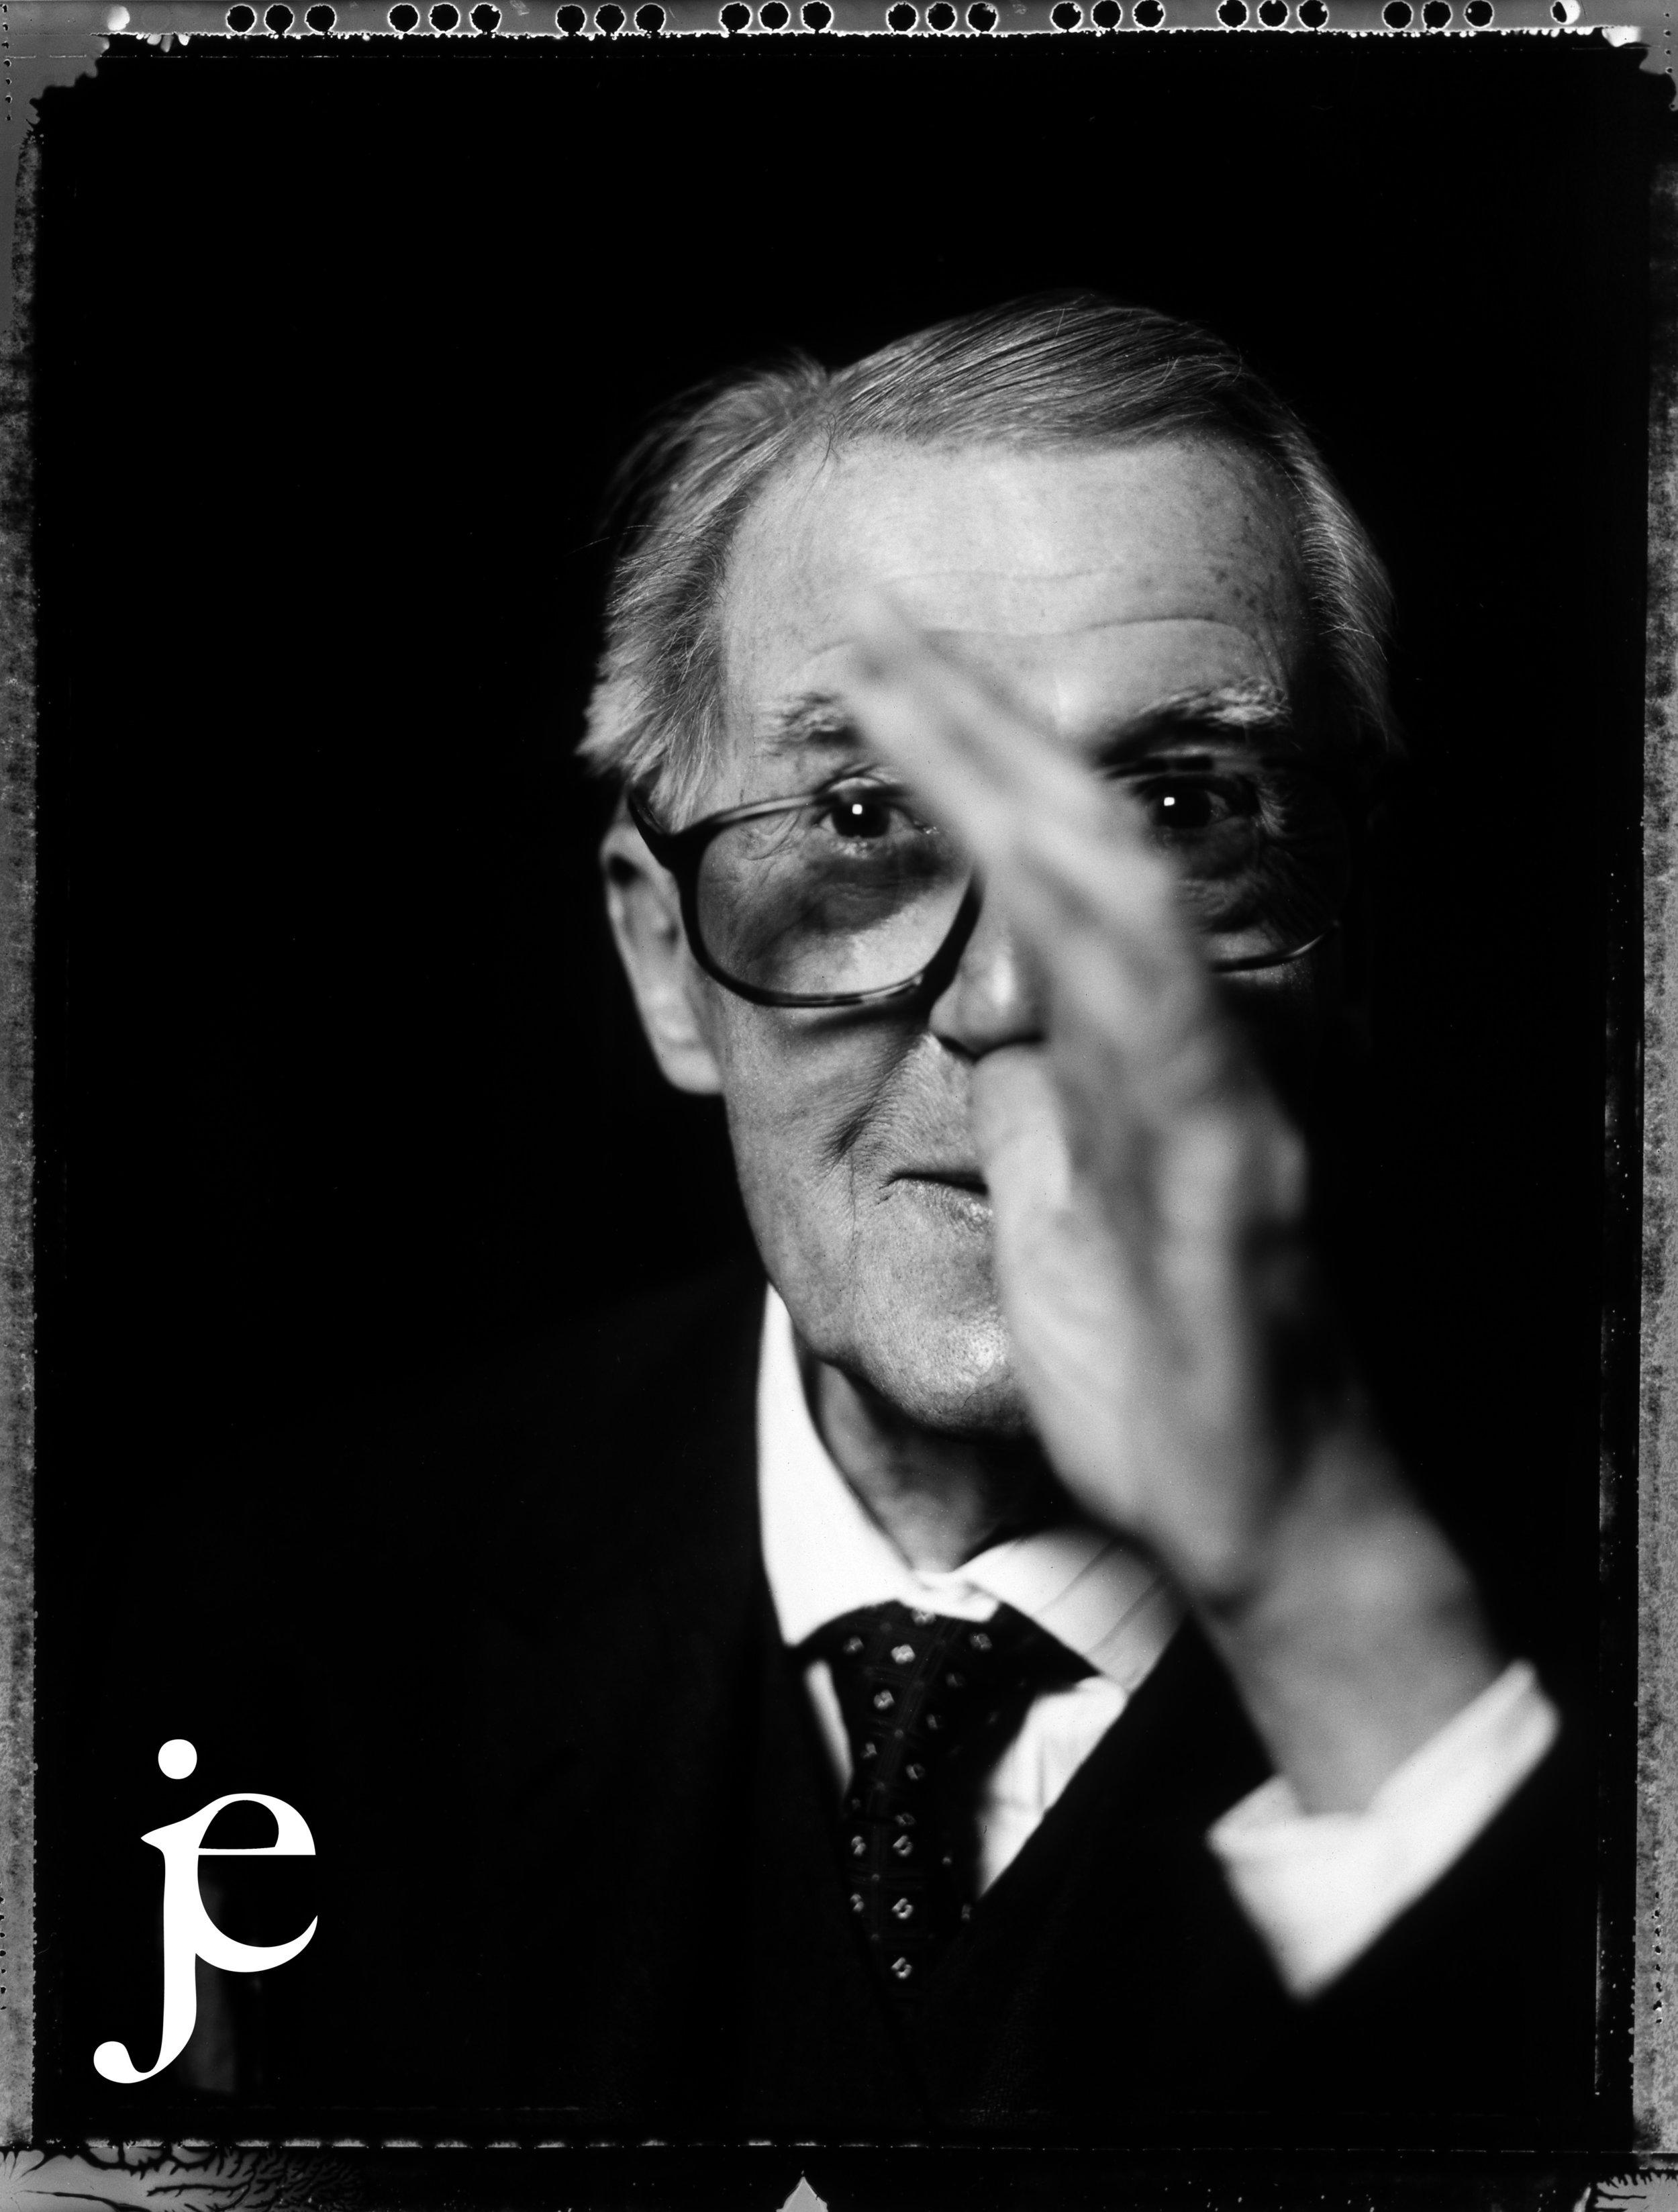 Sir Hardy Amies, 1999